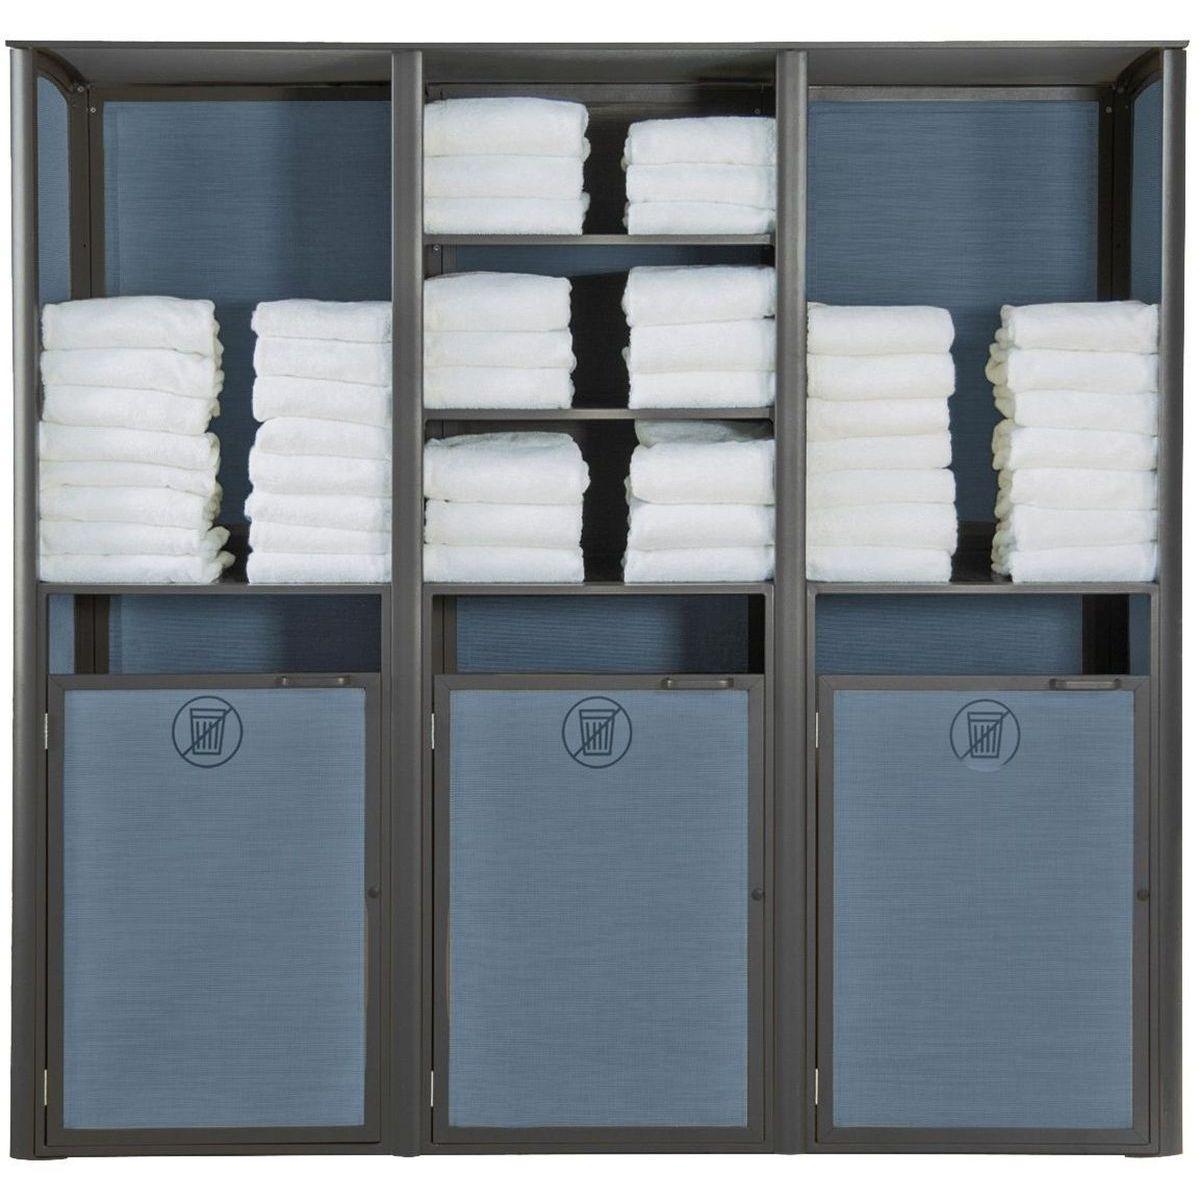 Grosfillex Sunset Towel Valet Triple Unit in Blue/Volcanic Black